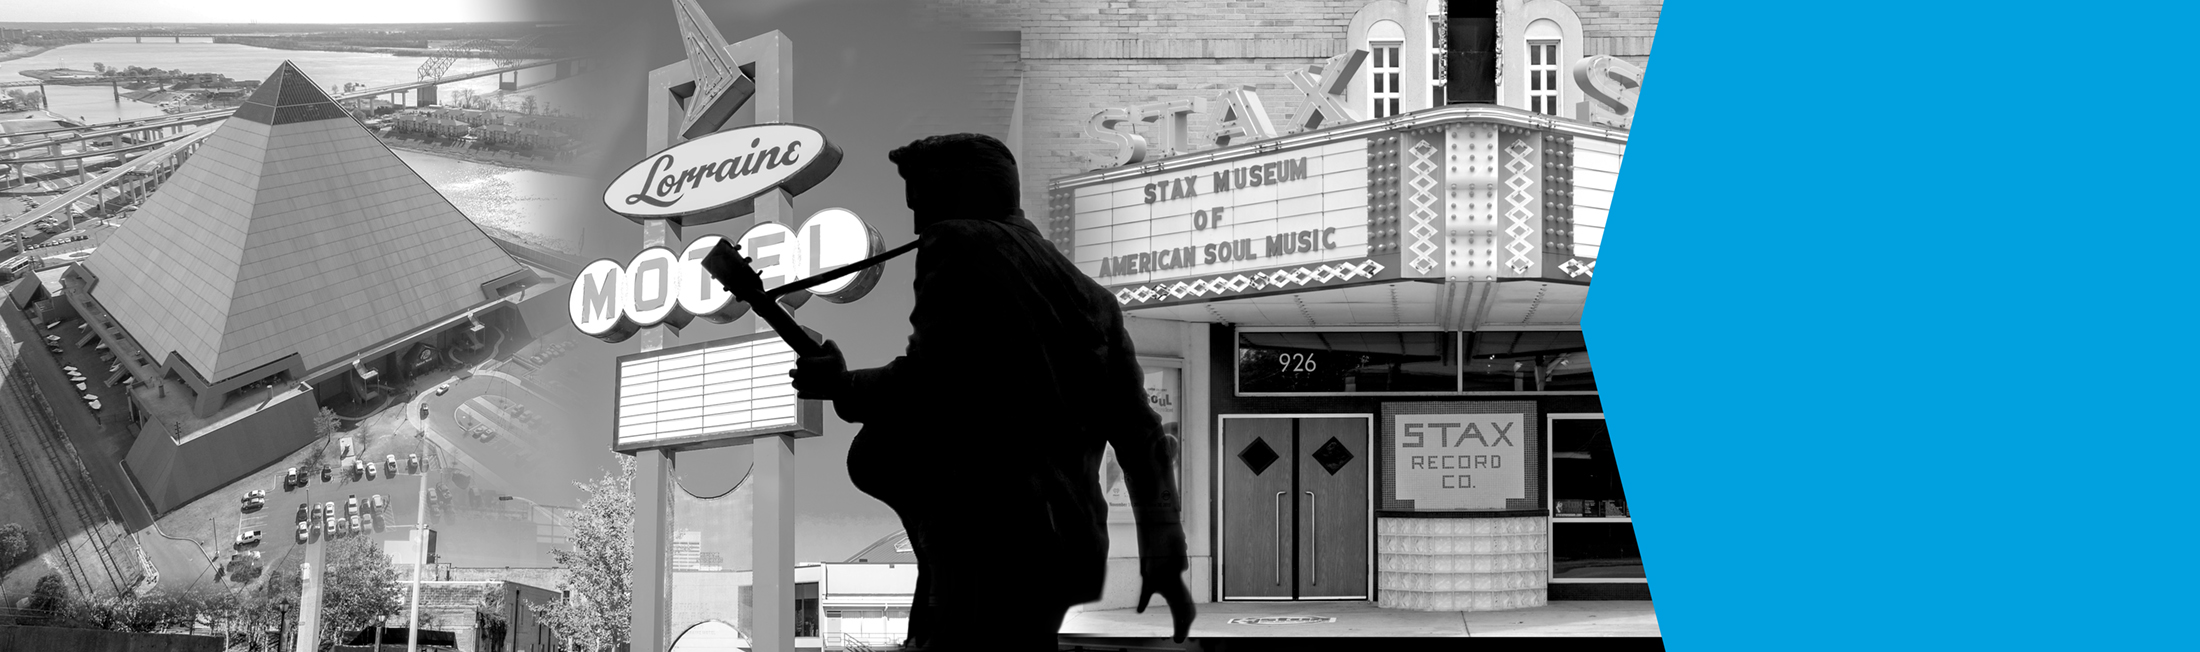 LSIGraphics_Environmental-Graphics_Memphis-Mural_Dreamcapture_Memphis-TN